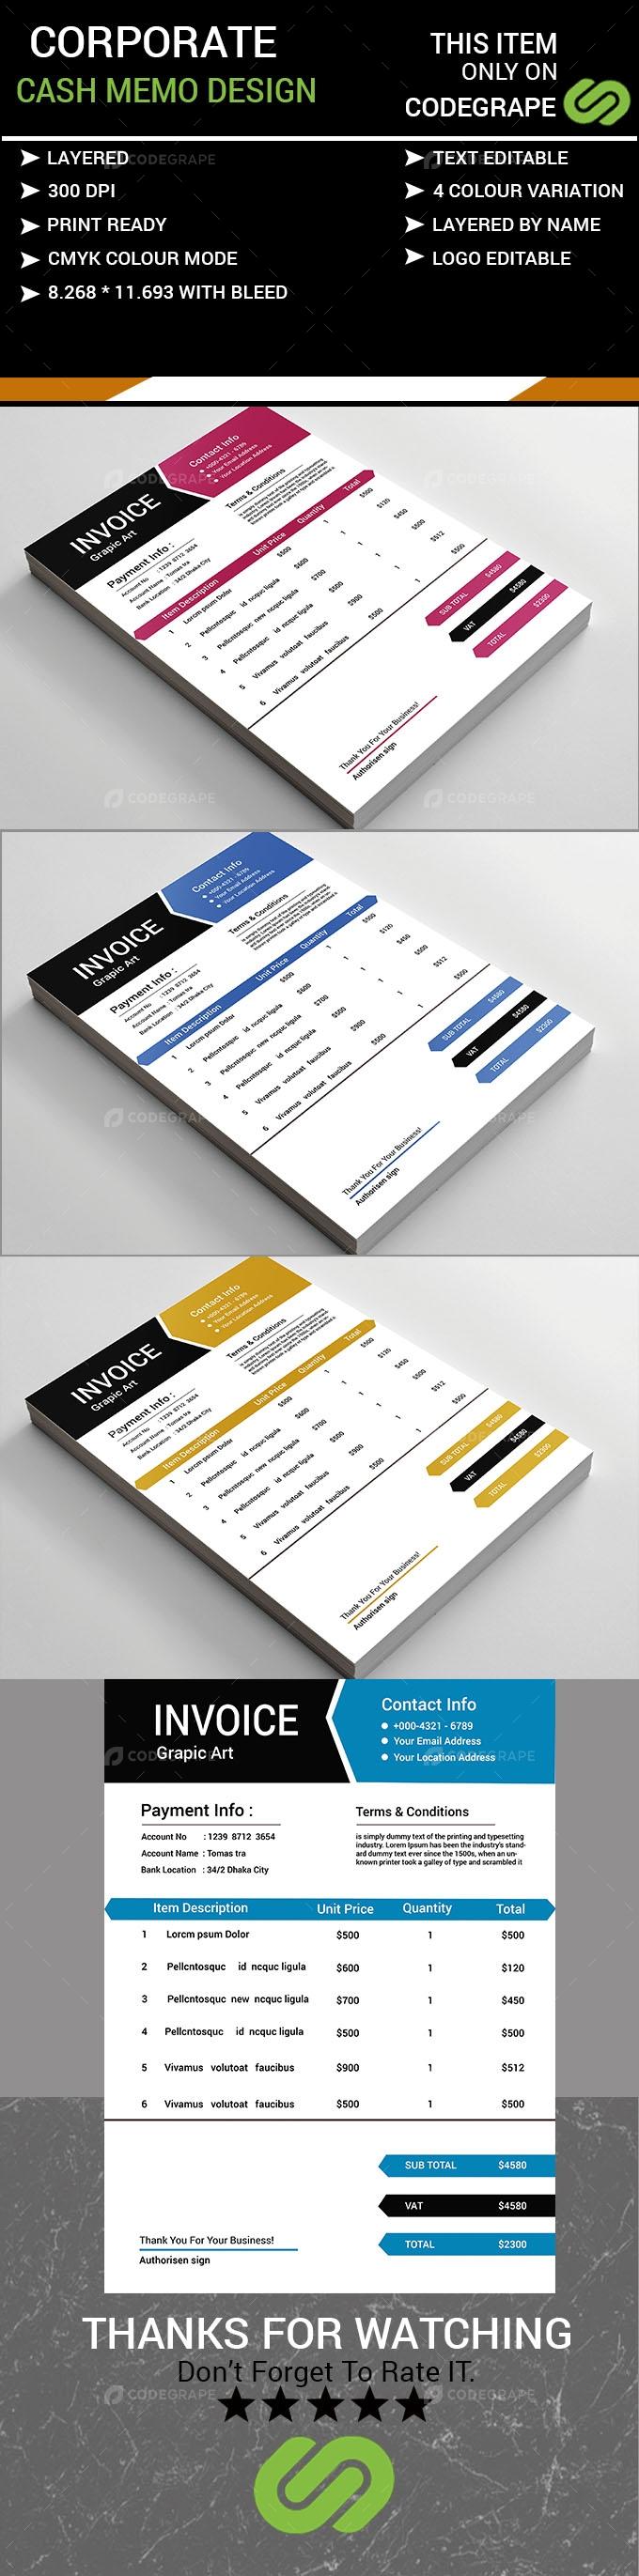 Corporate Cash Memo Design